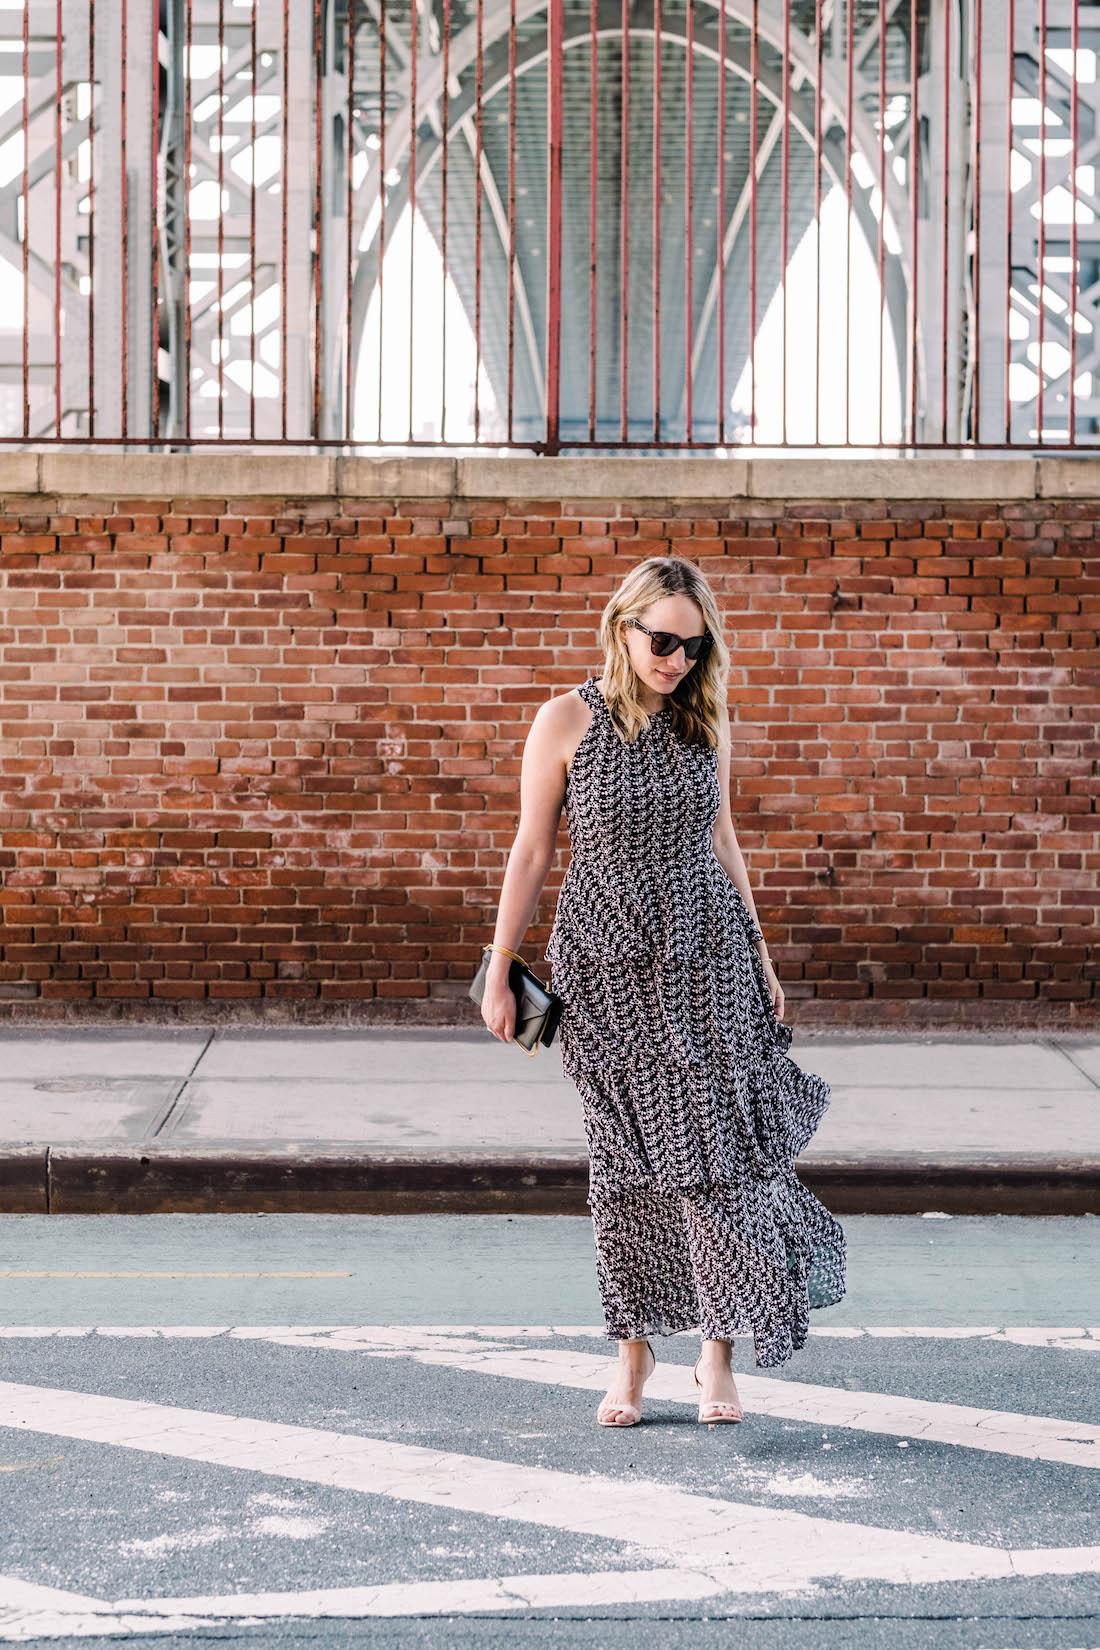 tommy hilfiger dress - the stripe